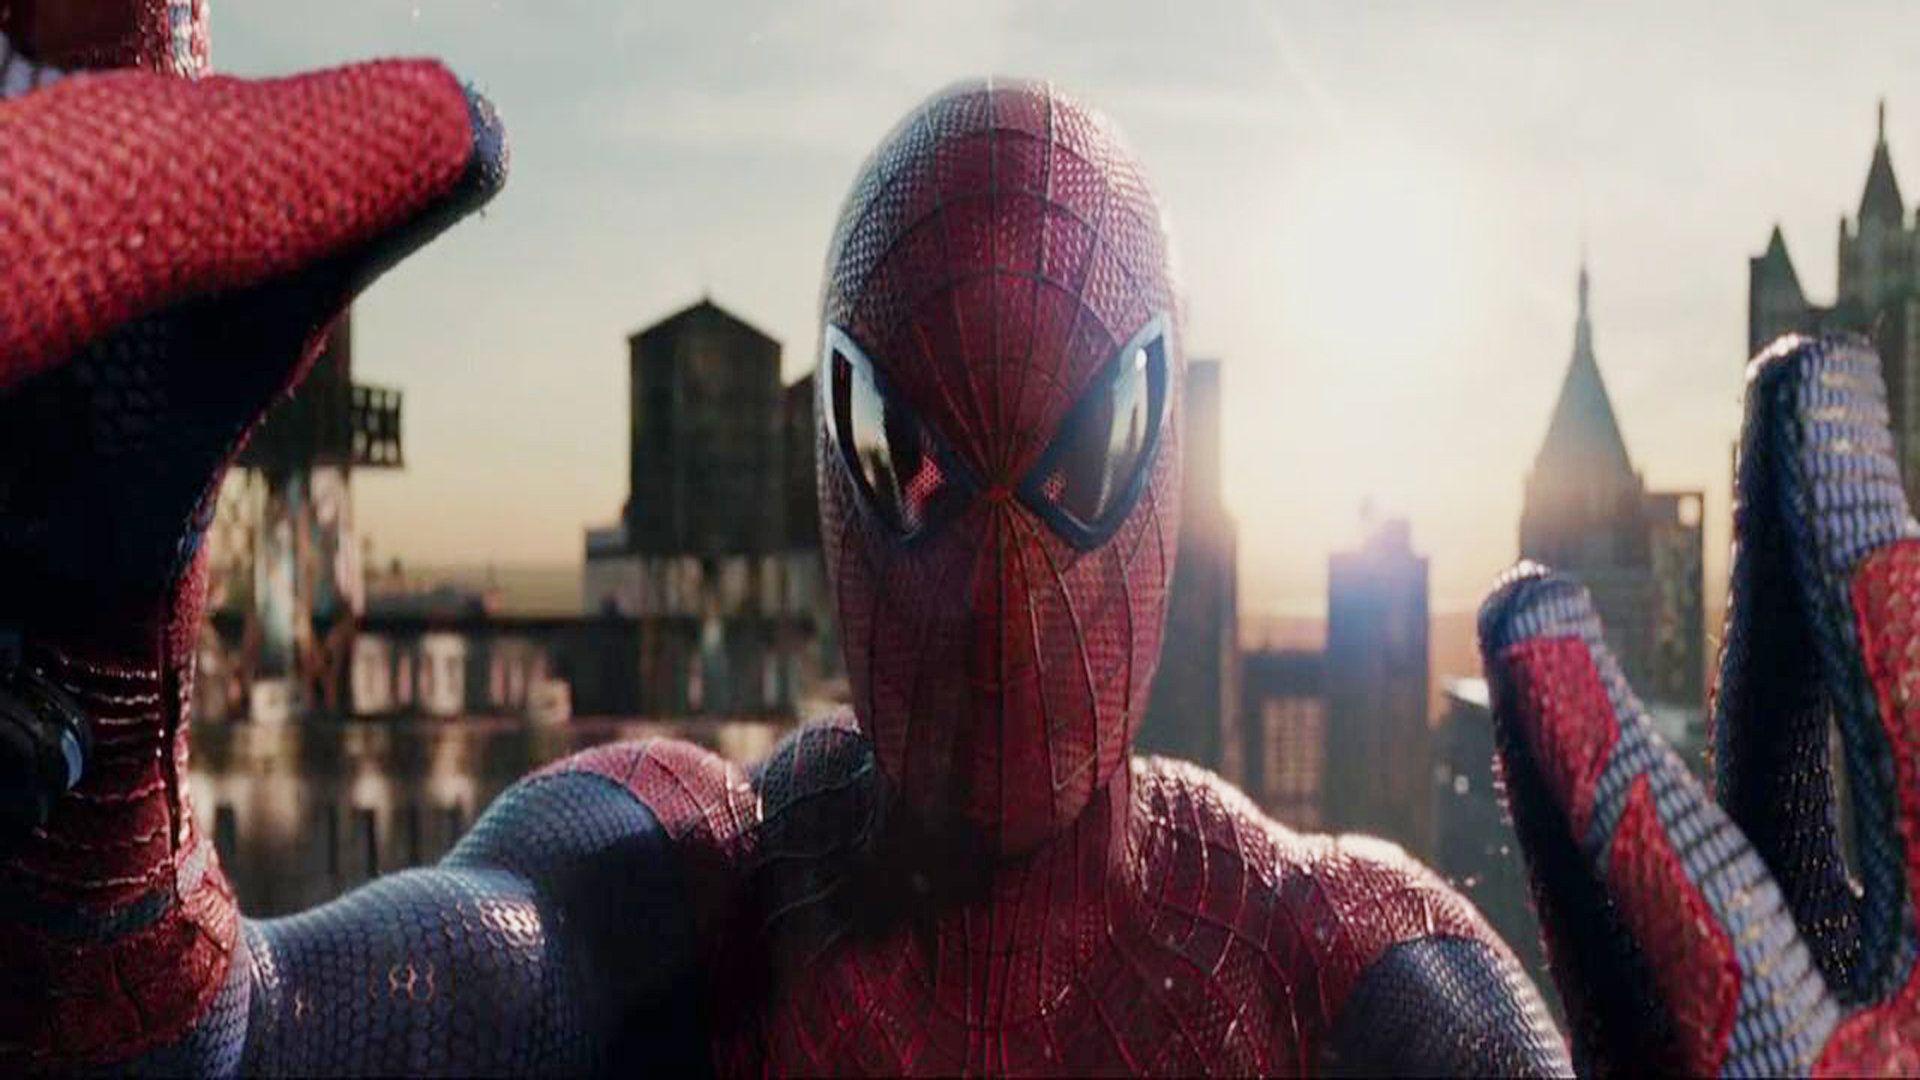 Spider Man HD Desktop Wallpaper High Definition Fullscreen Wallpapers Of Spiderman 4